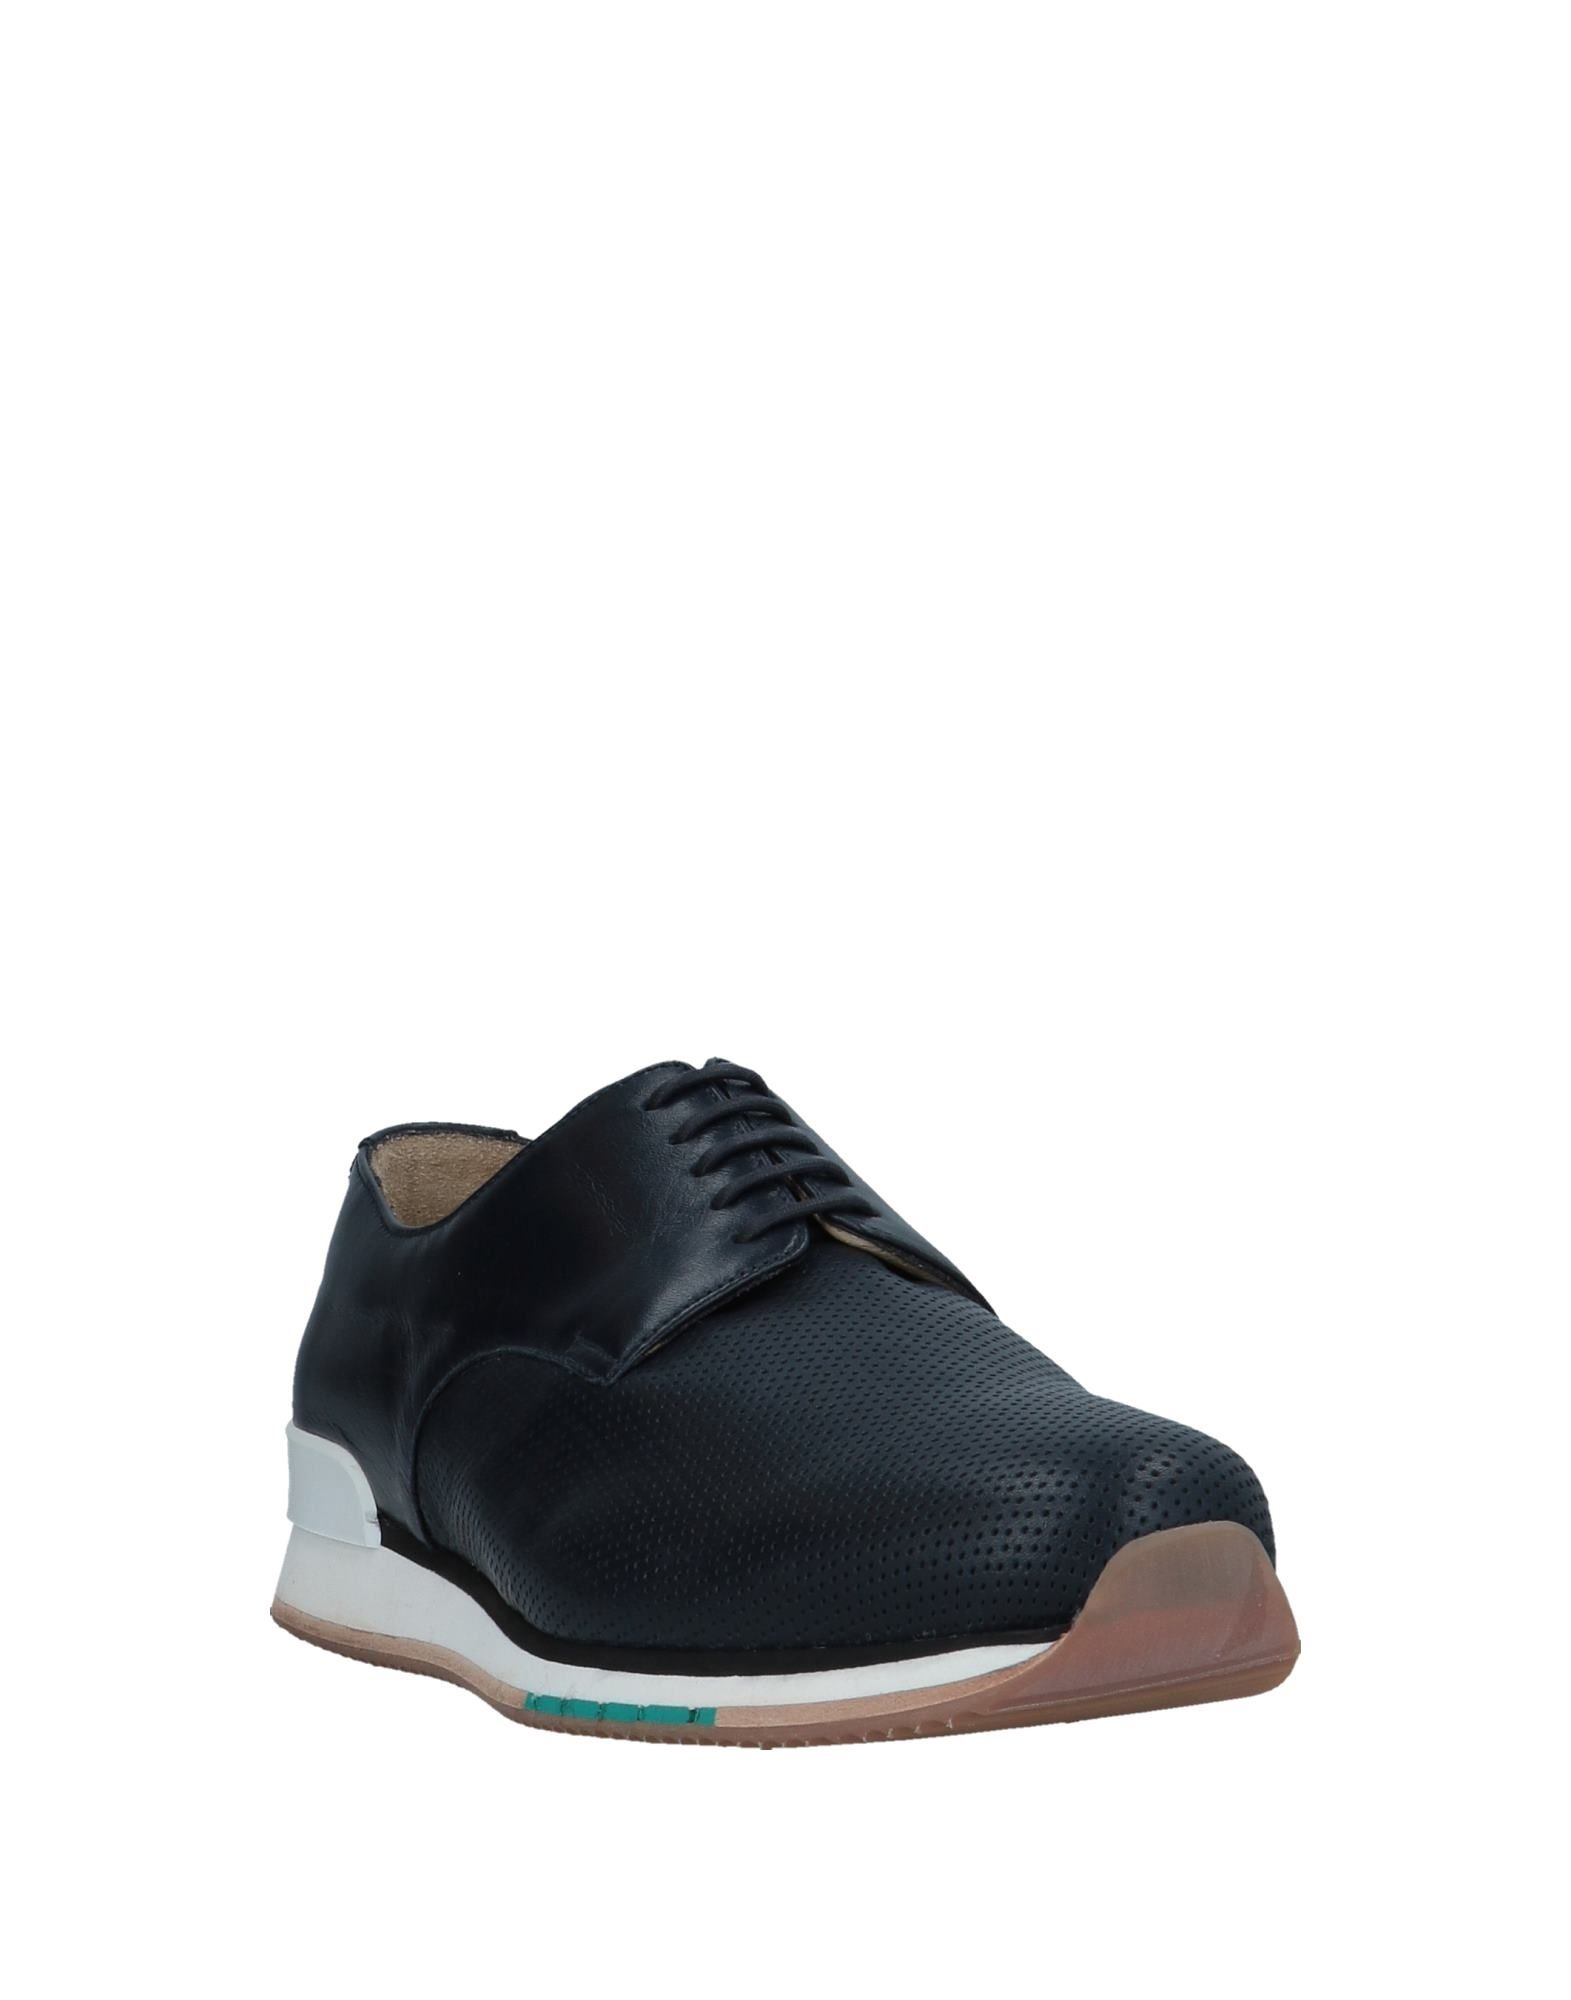 A.Testoni Sneakers Herren  11542592XC Gute Qualität beliebte Schuhe